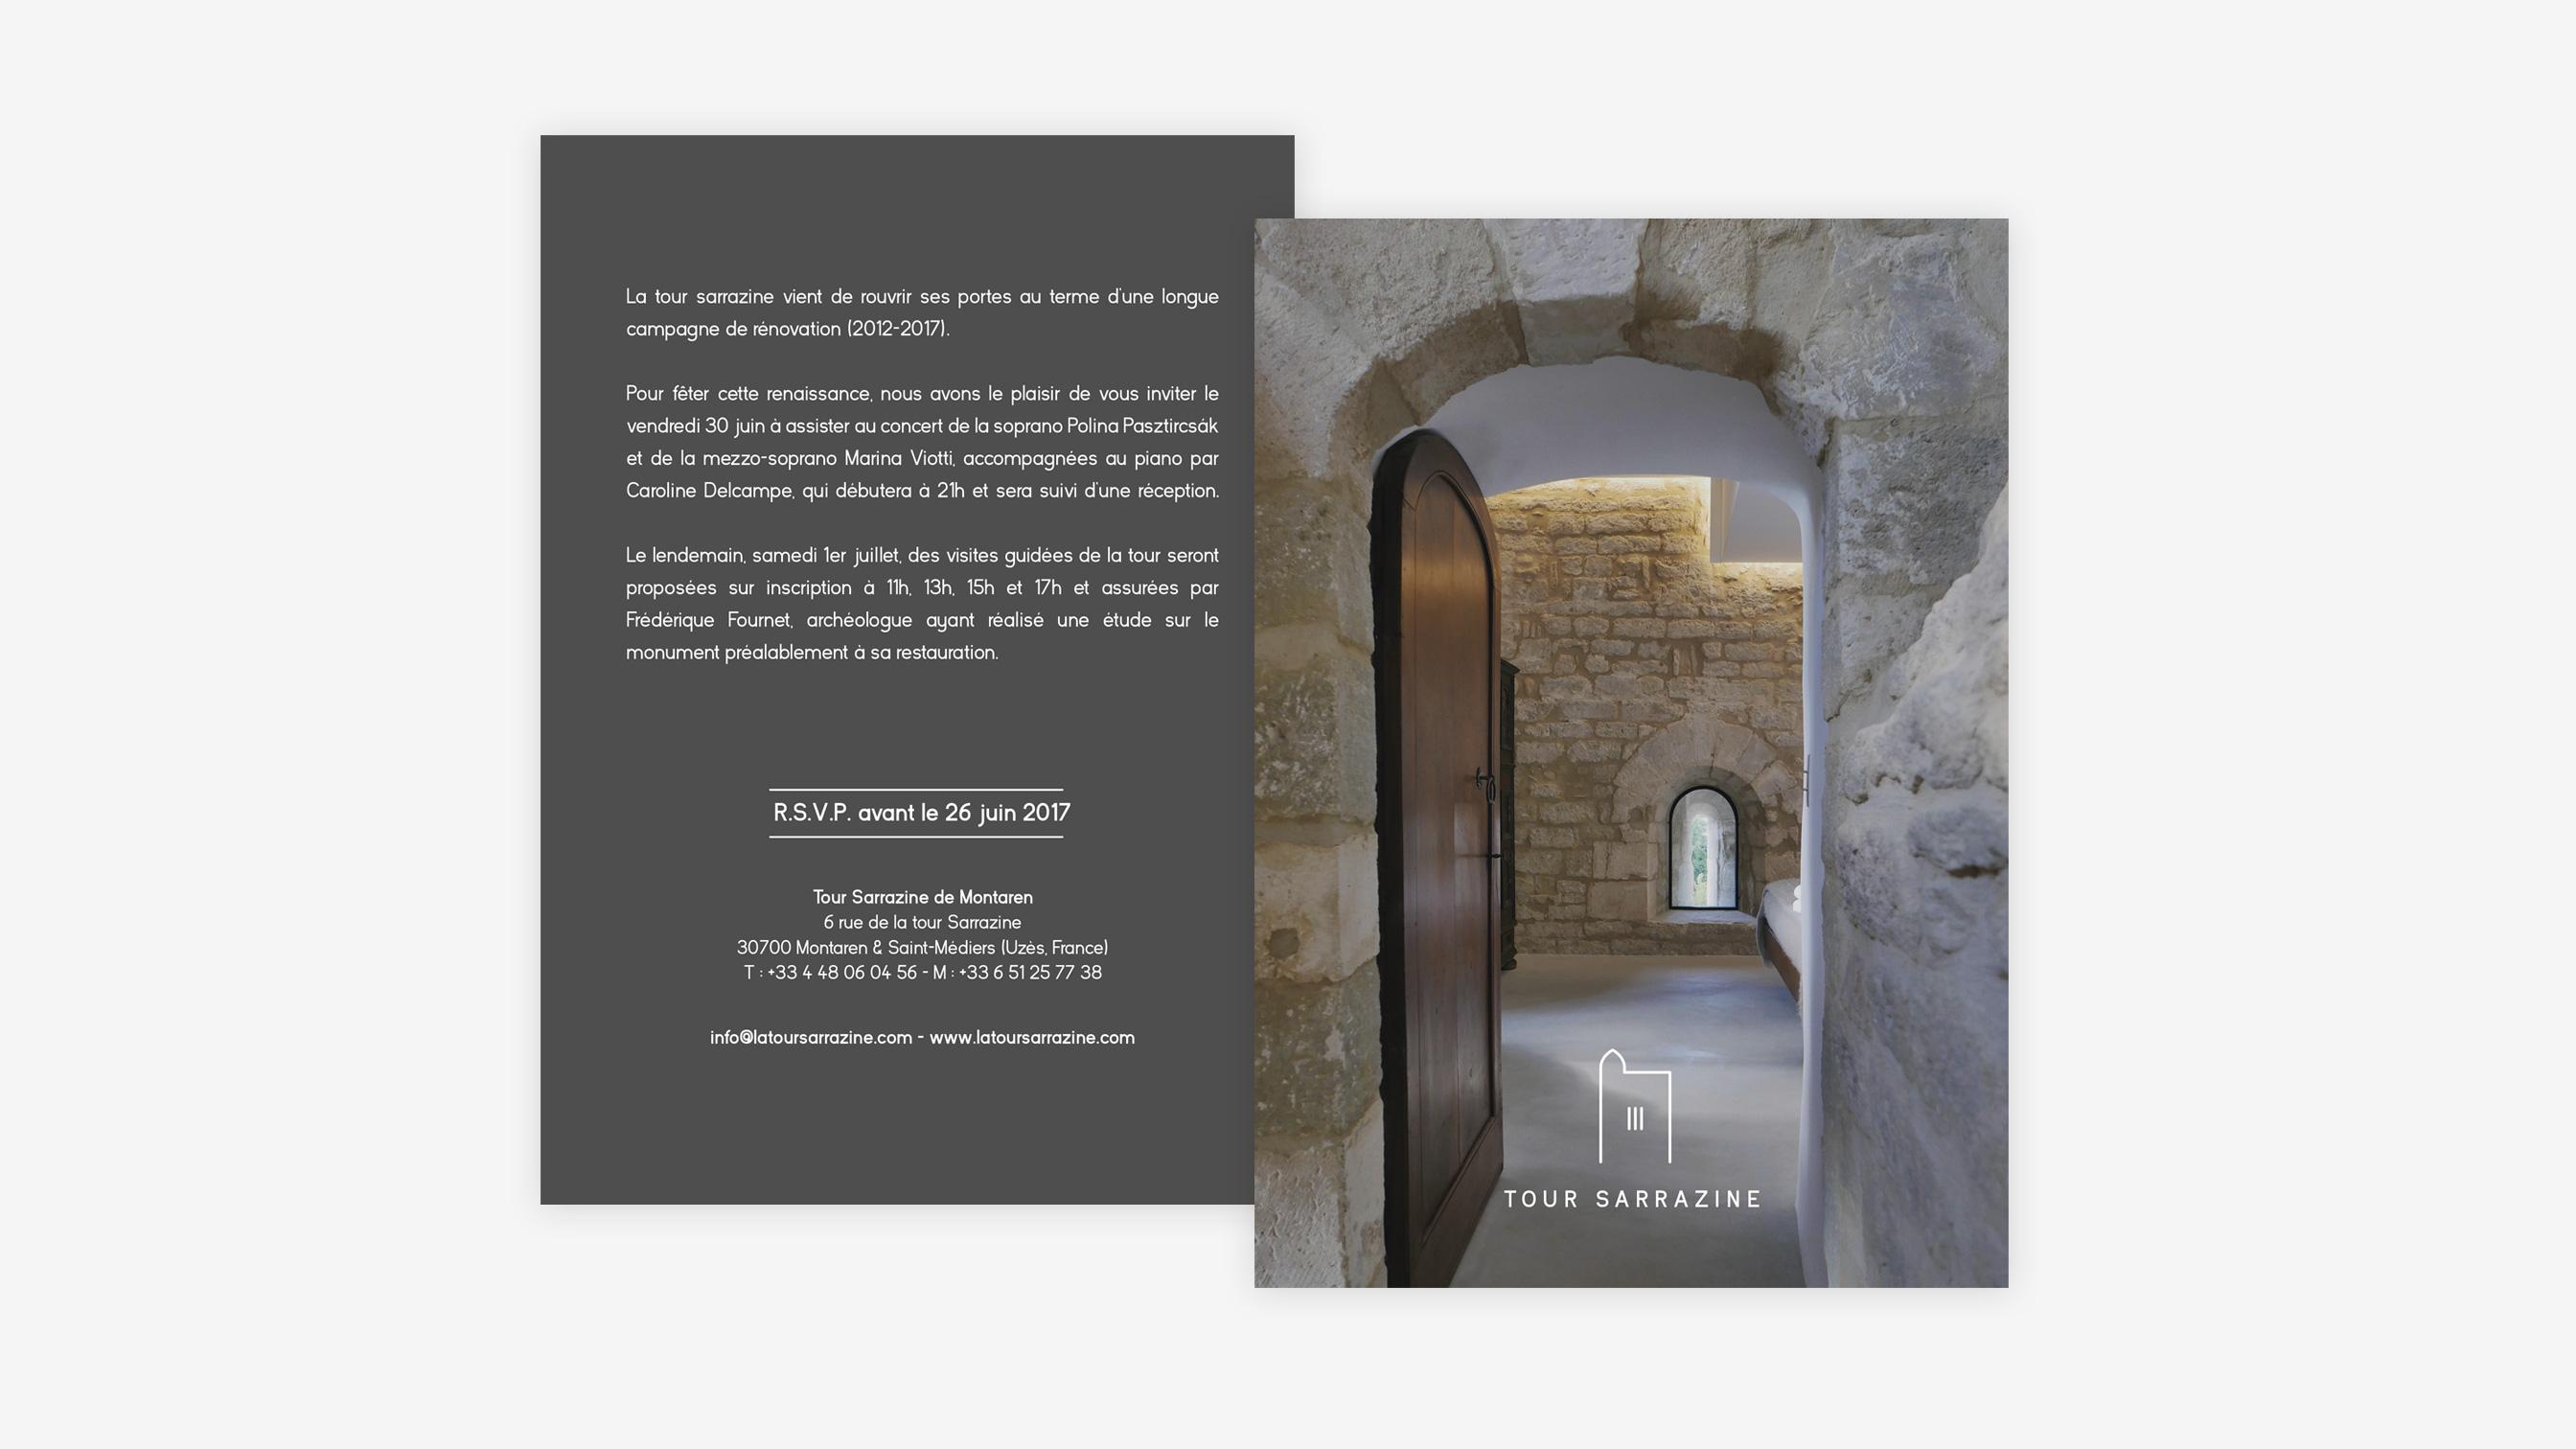 07-tour-sarrazine-pikteo-webdesign-graphic-design-freelance-paris-bruxelles-londres